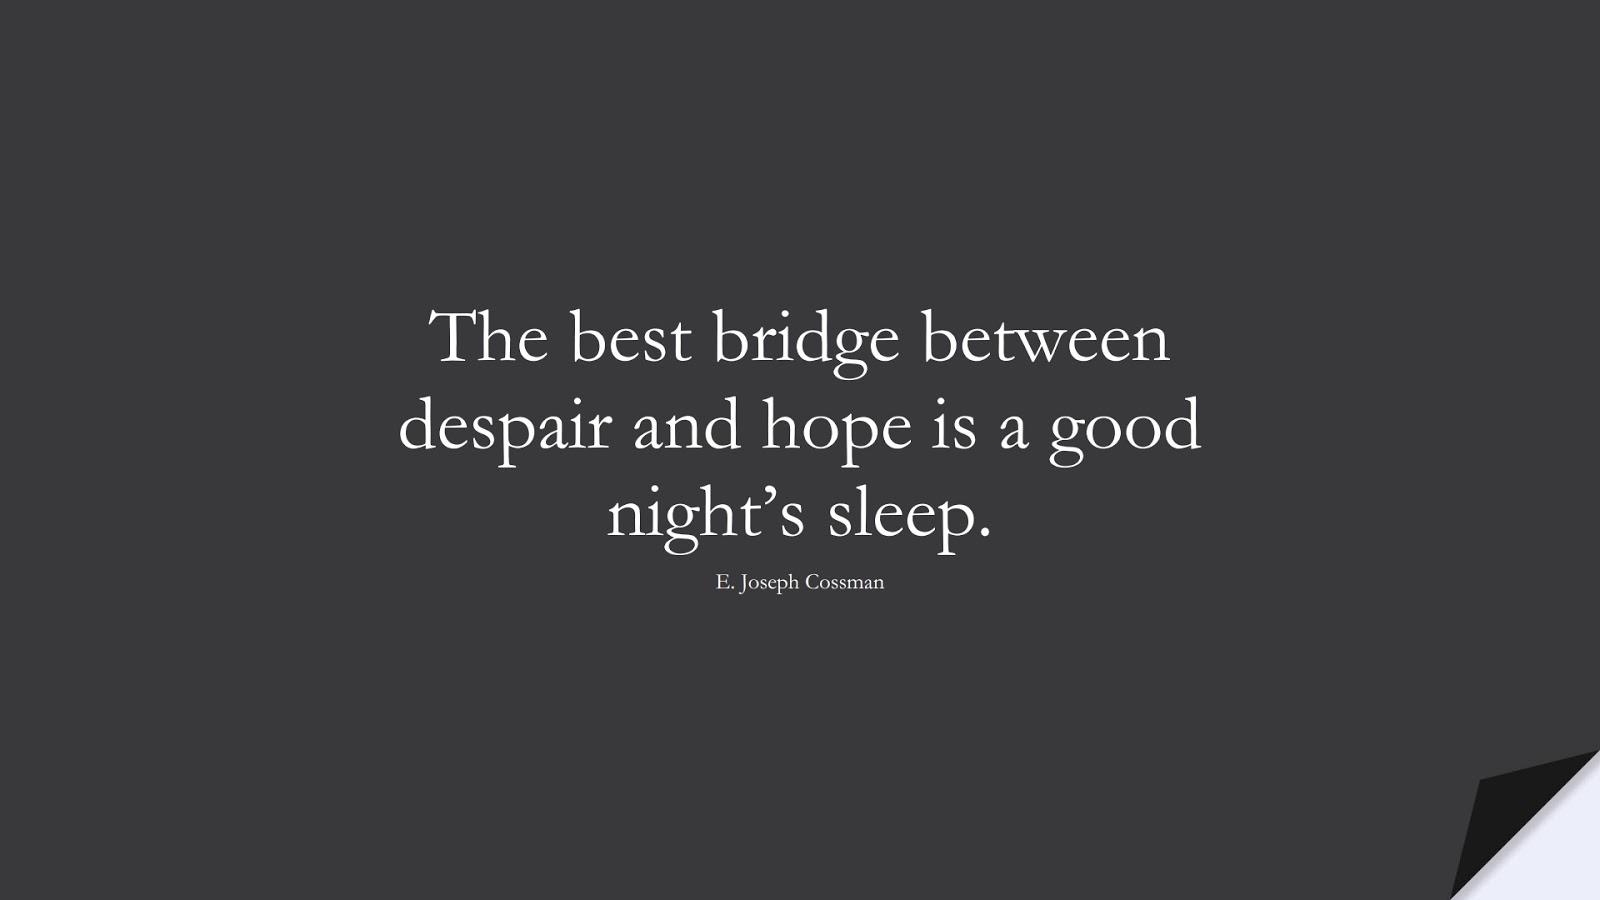 The best bridge between despair and hope is a good night's sleep. (E. Joseph Cossman);  #HopeQuotes